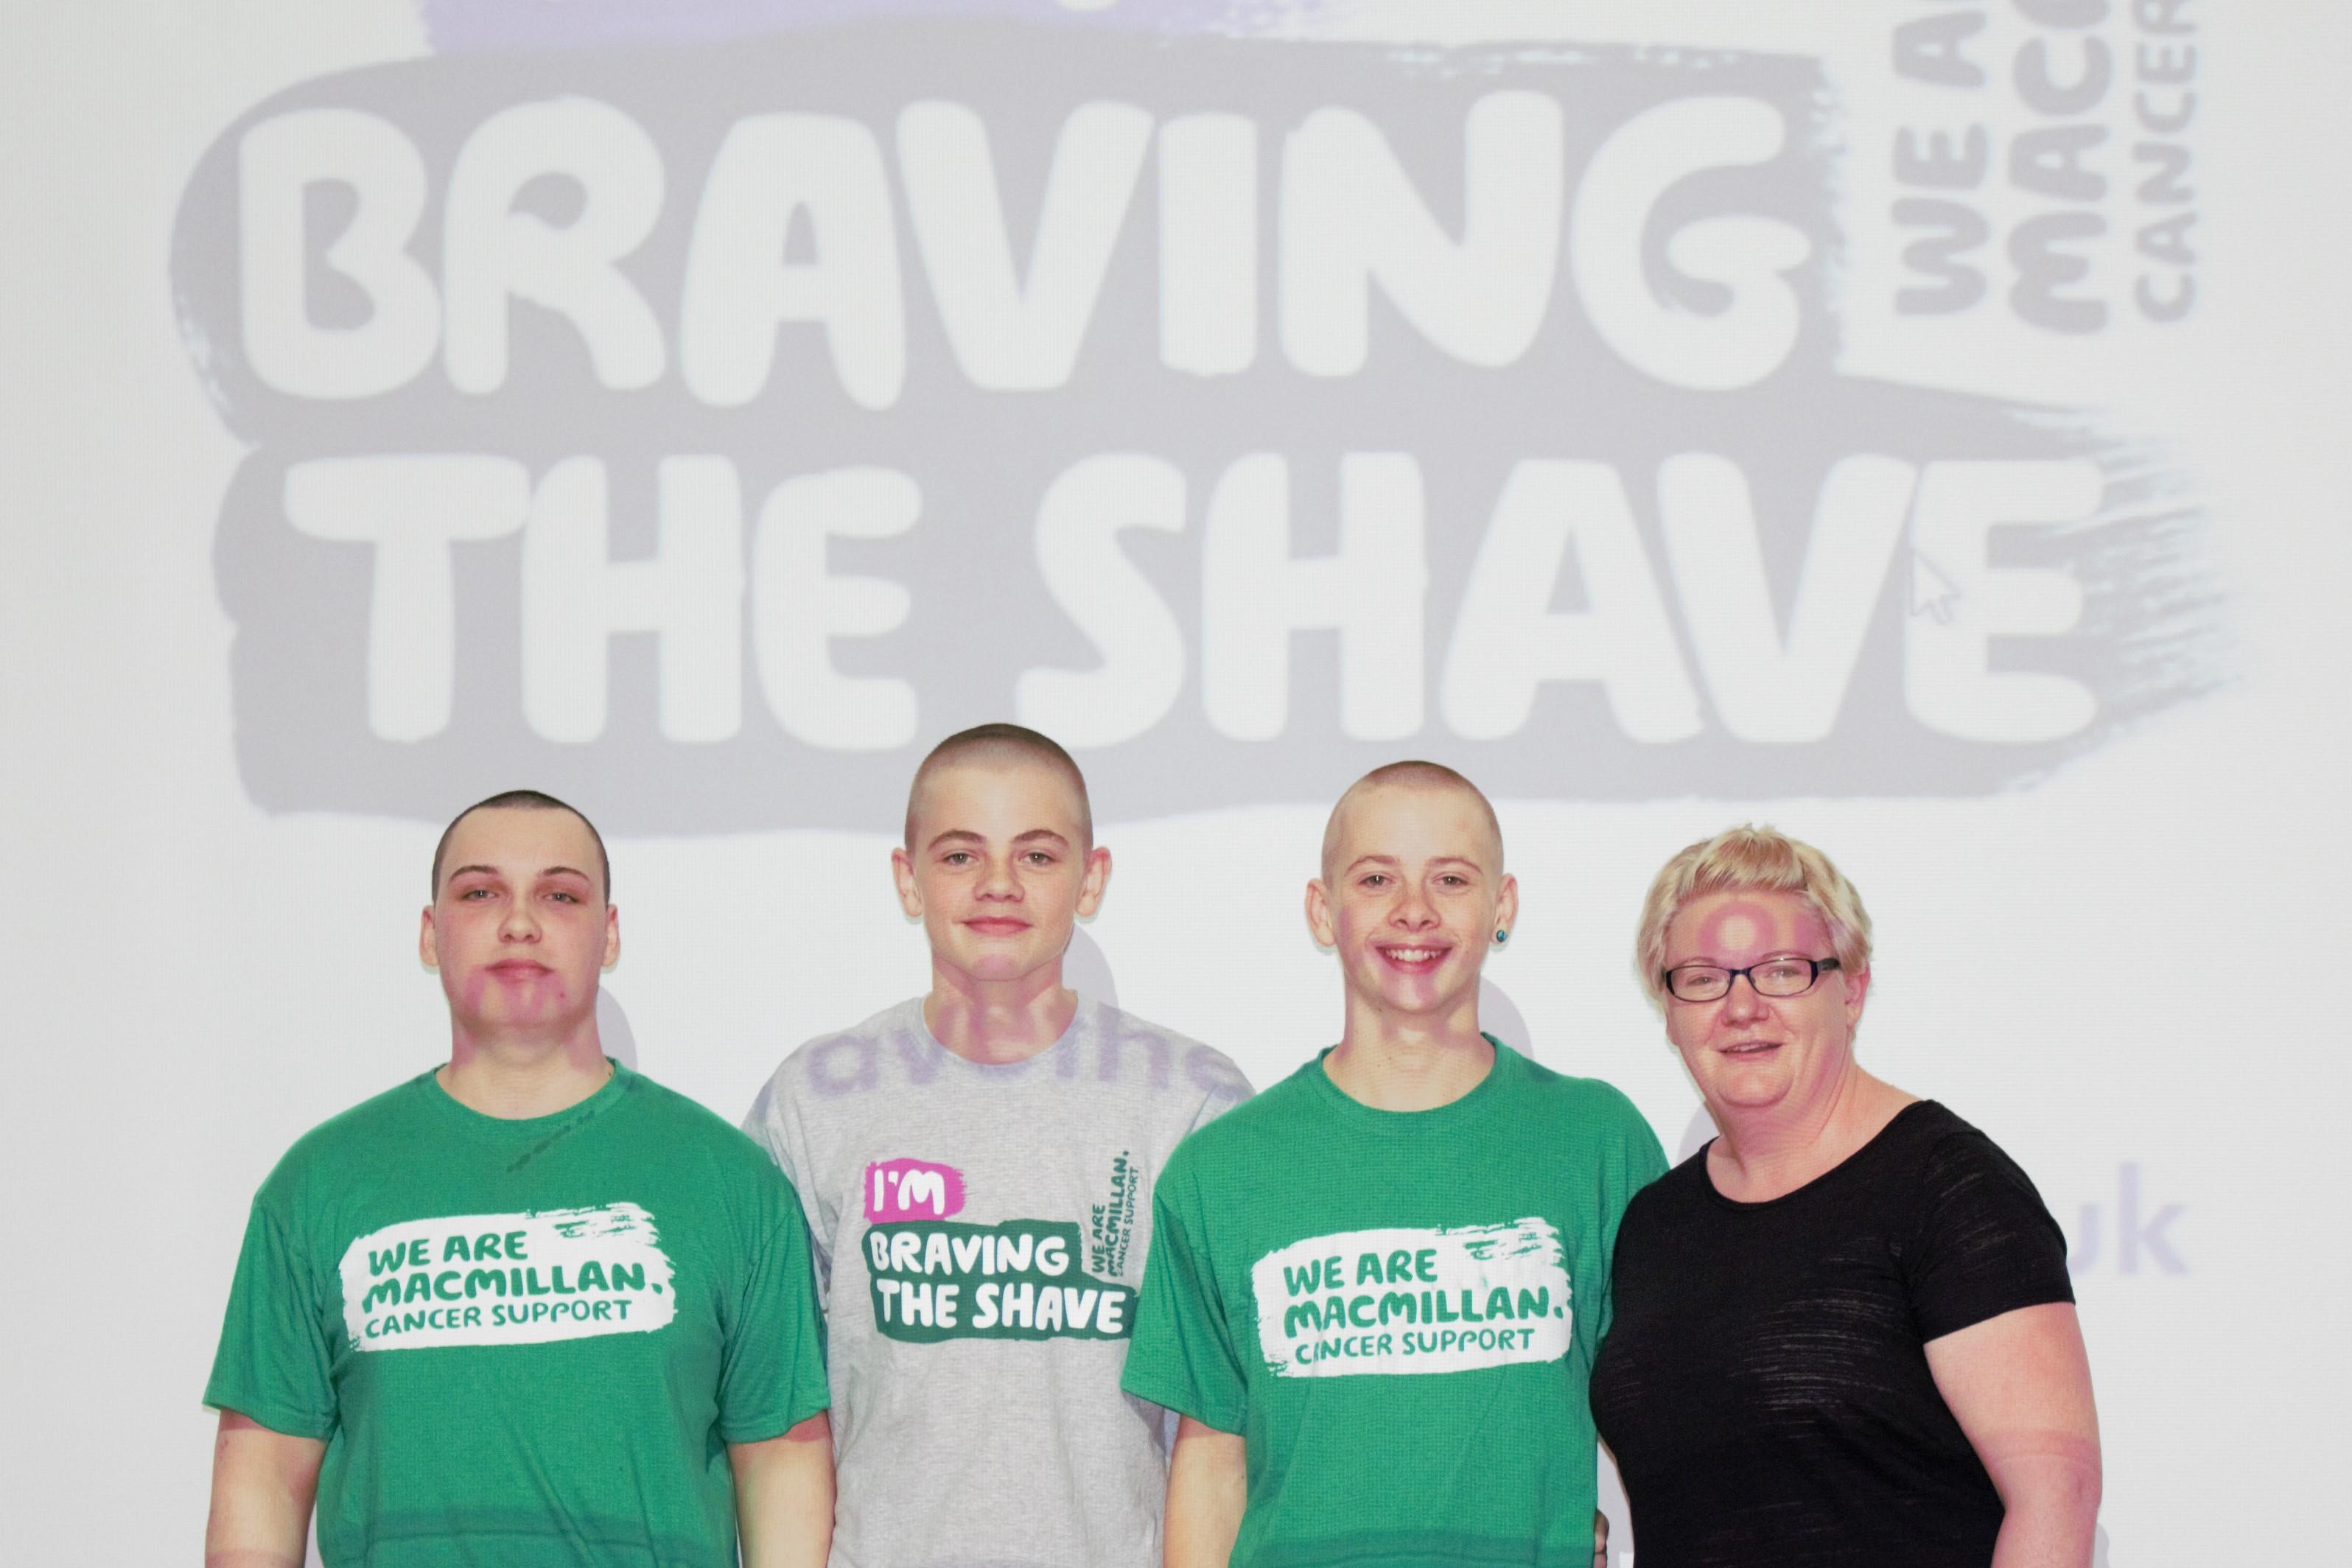 James Poyner, Thomas Hopkins, Oliver Hopkins had their heads shaved by hairdresser Hayley Johnston.